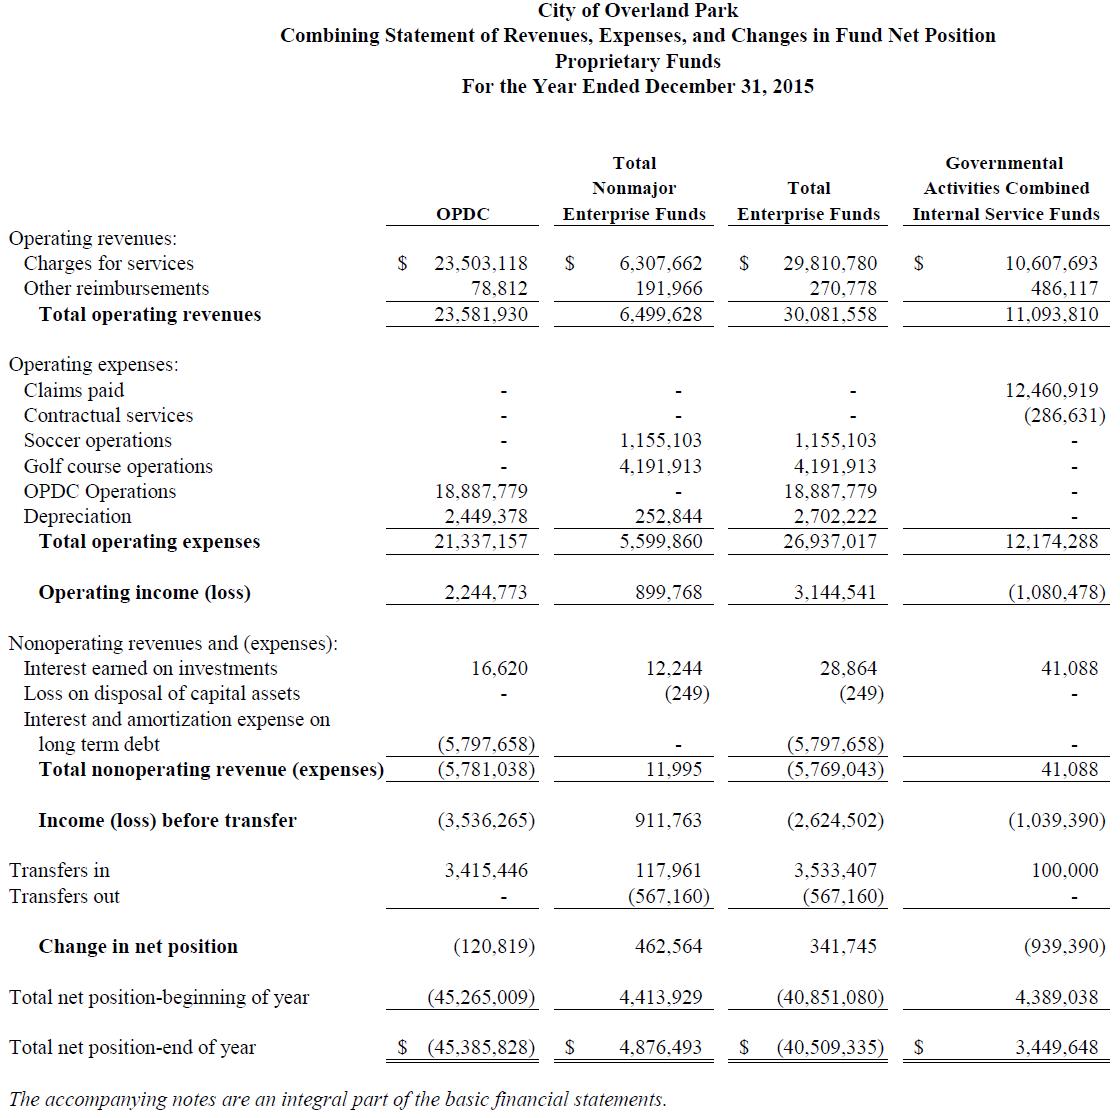 Income Statement - Proprietary Funds